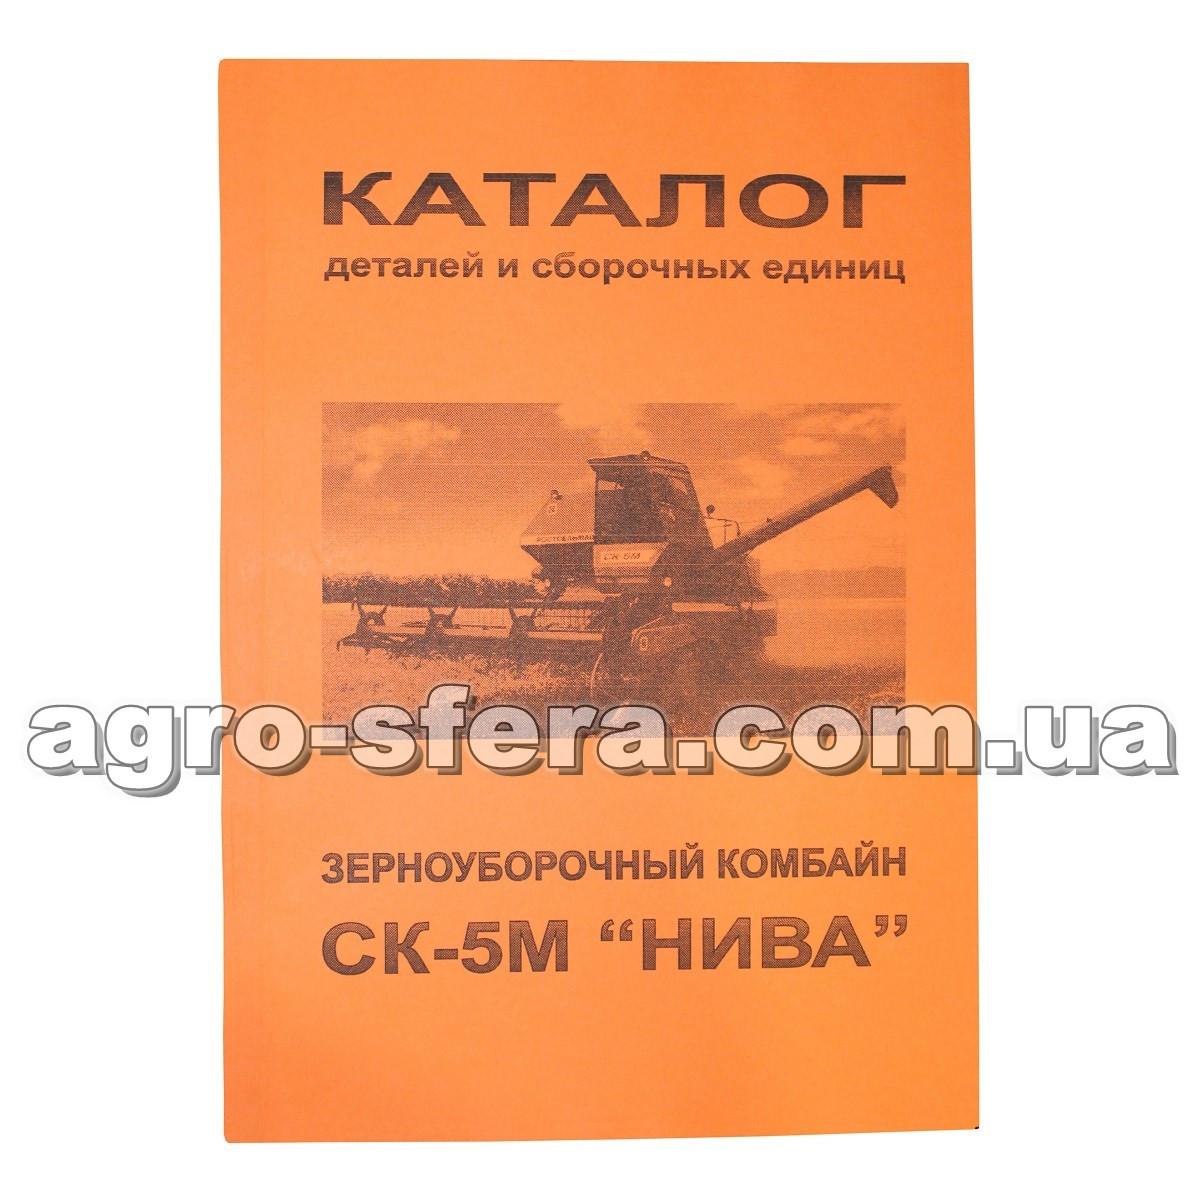 Каталог запчастей комбайна НИВА СК-5М - Агро-Сфера в Мелитополе